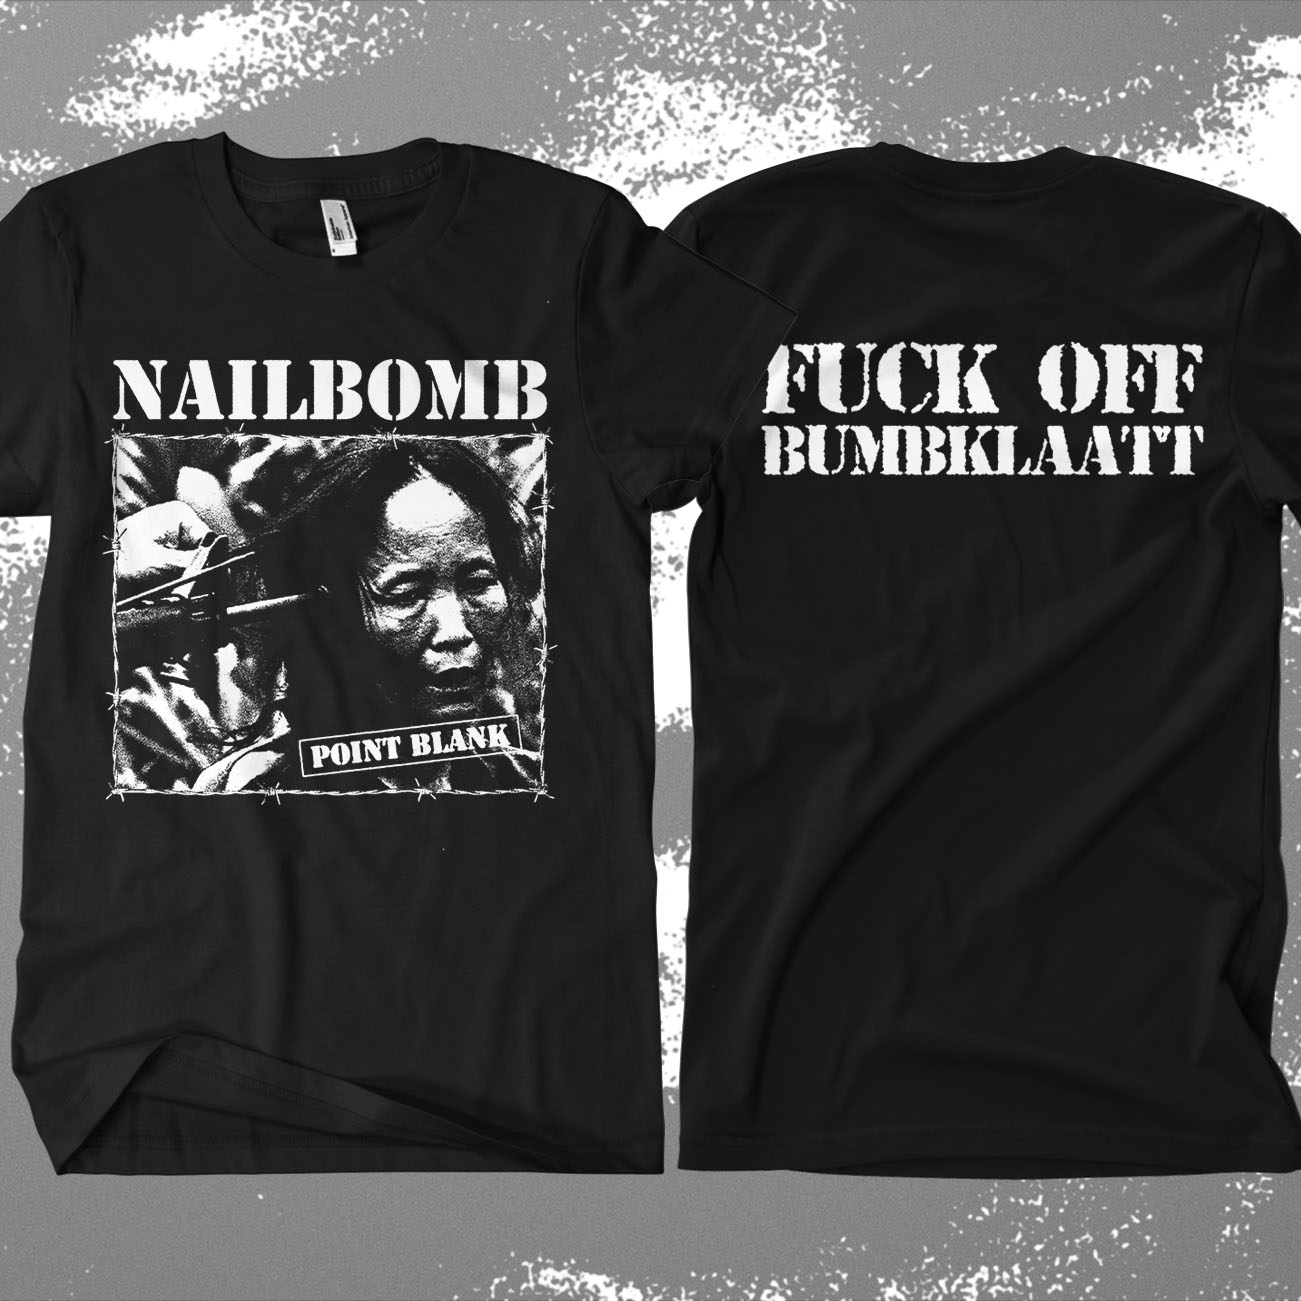 Nailbomb - 'Bumbklaatt' T-Shirt - Soulfly